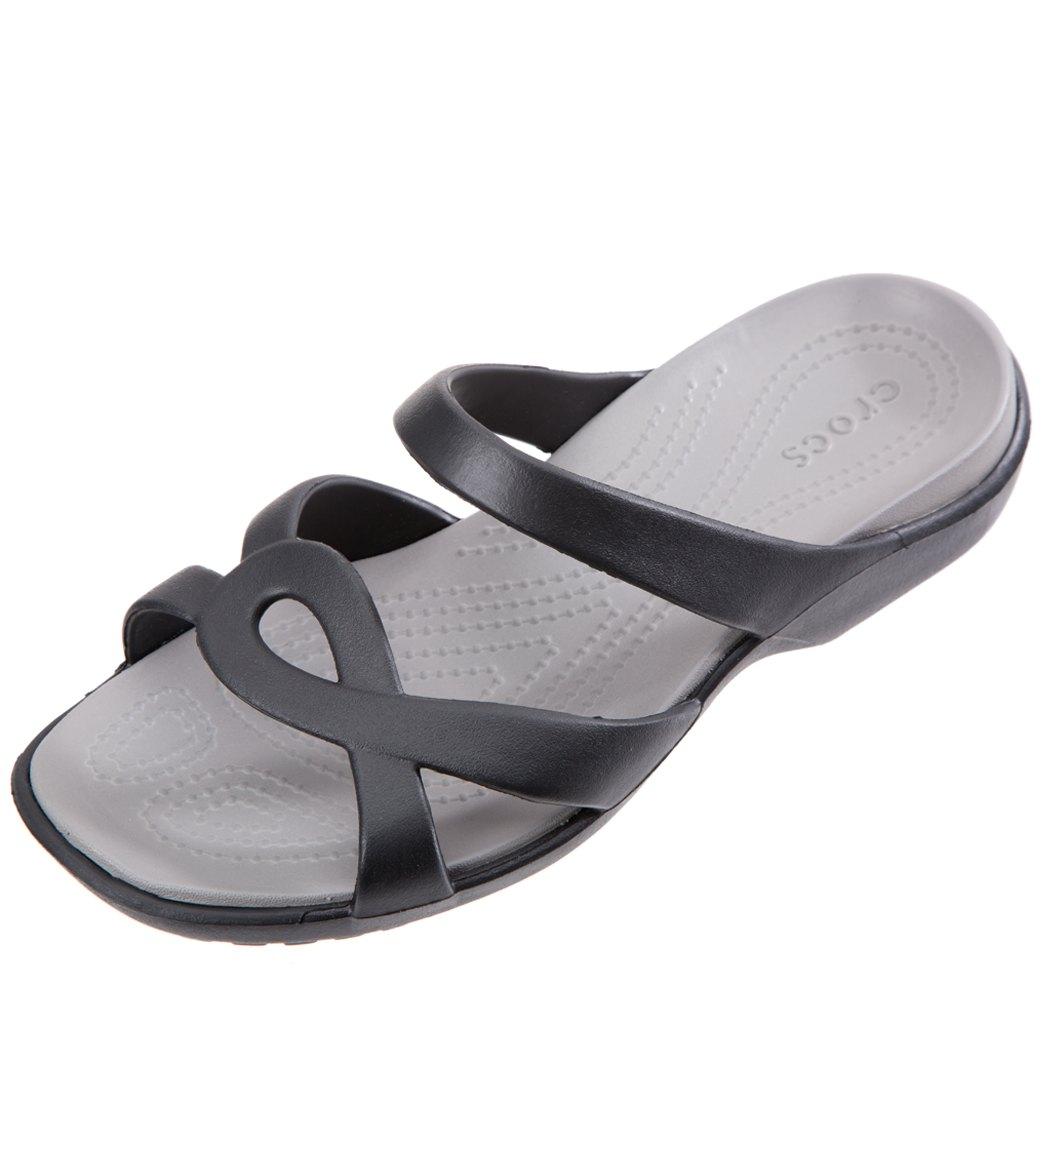 bf8ceffeb Crocs Women s Meleen Twist Sandal at SwimOutlet.com